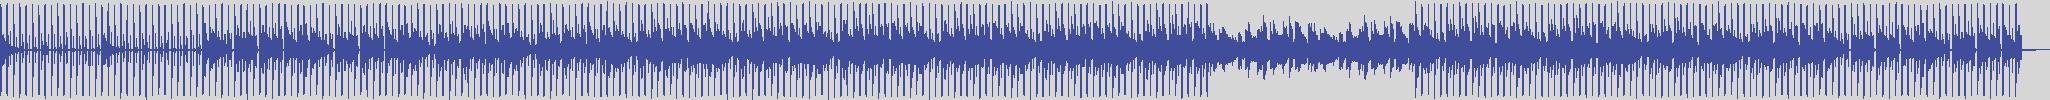 worldwide_music_records [WMR004] Fundamental Lounge Union - Insurance [Original Mix] audio wave form